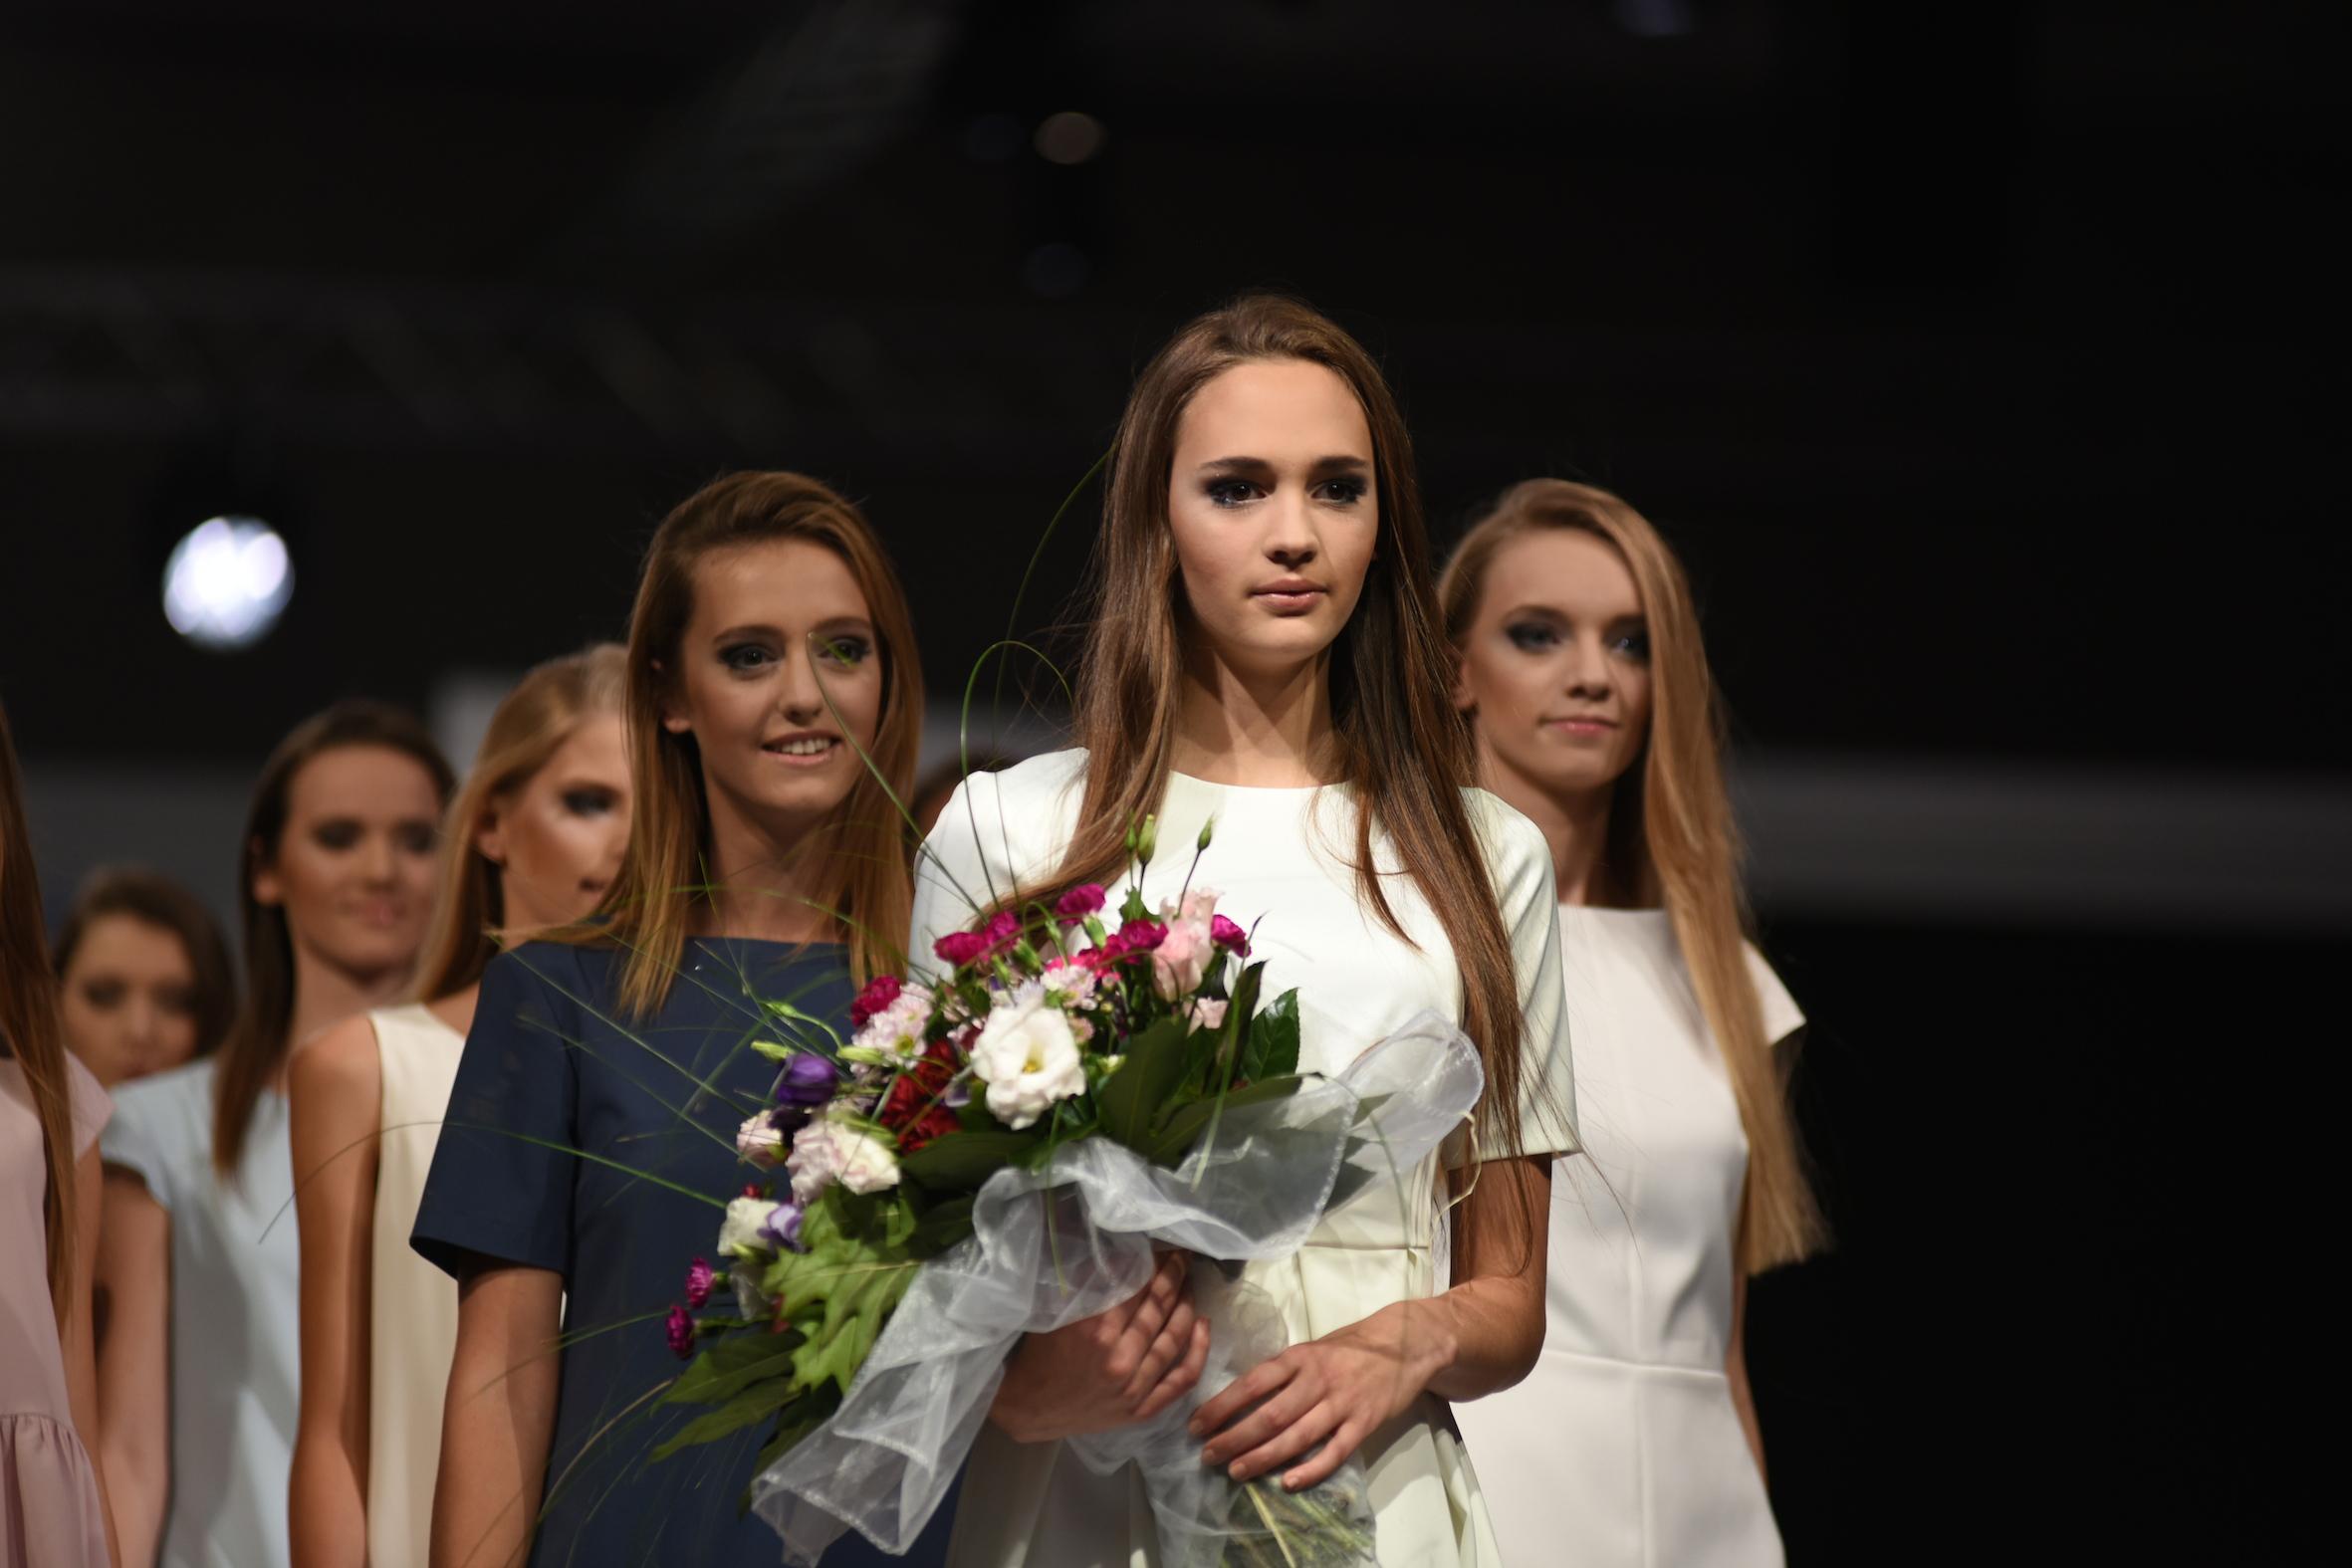 Konkursy News  RUSZA KOLEJNA EDYCJA ELITE MODEL LOOK POLAND 2015